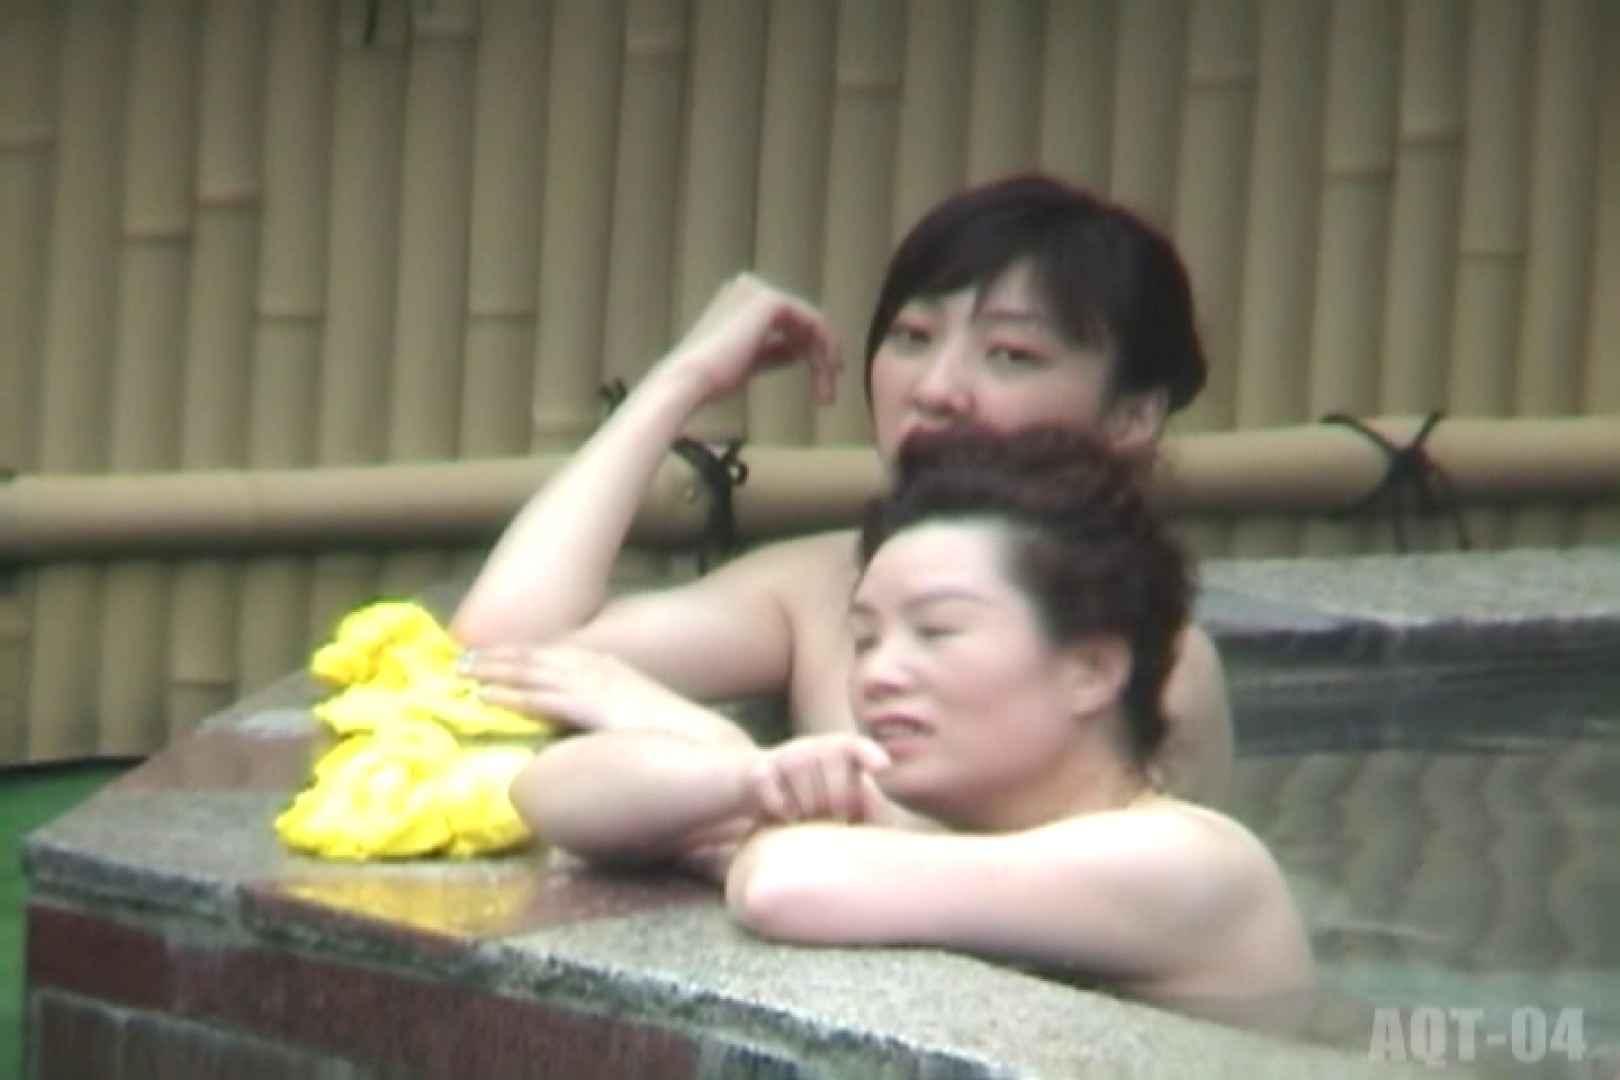 Aquaな露天風呂Vol.743 美しいOLの裸体 | 露天風呂突入  91pic 40